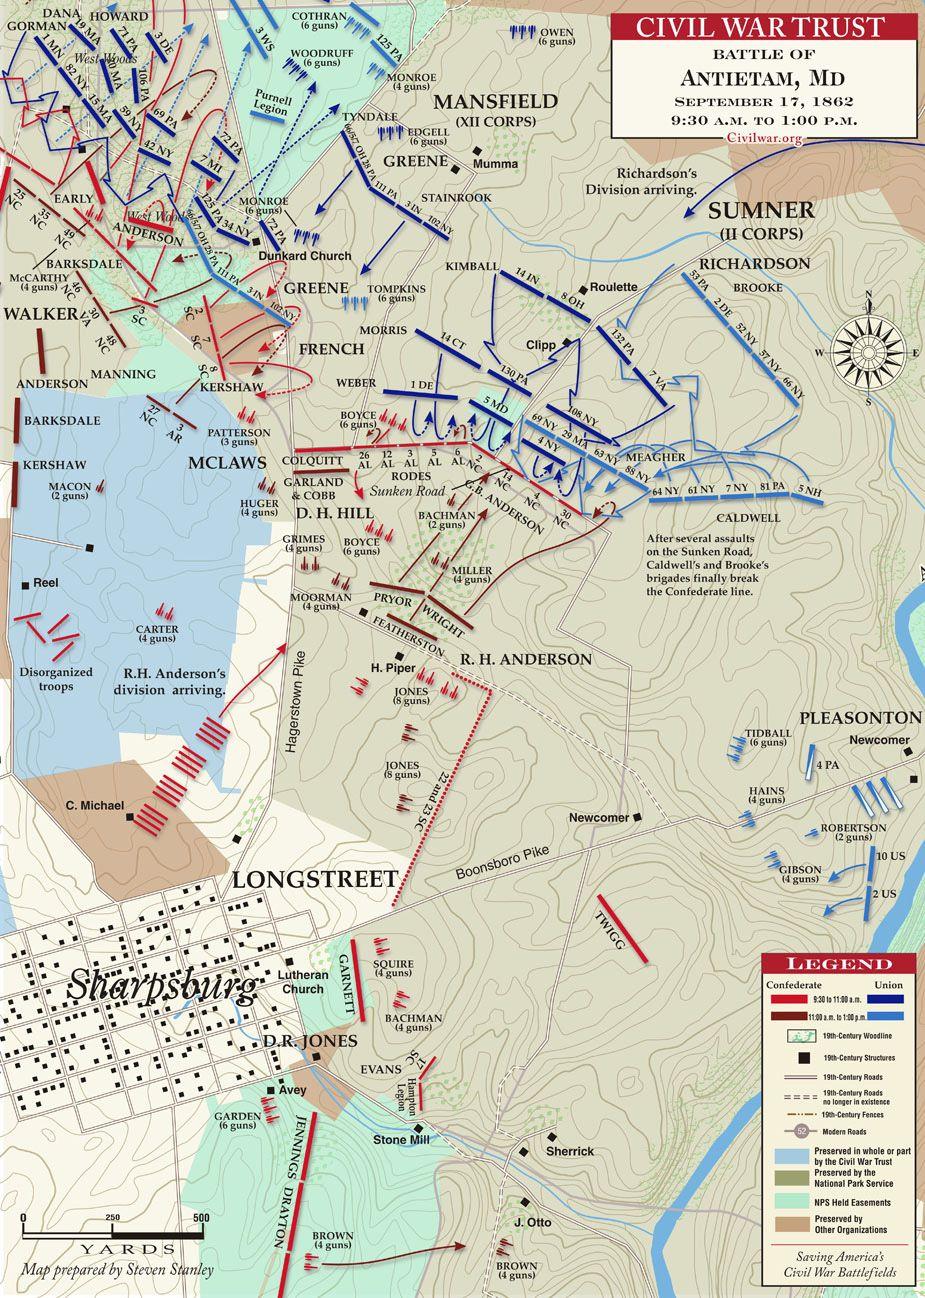 Antietam Sunken Road Am To Pm История Pinterest - Antietam on us map